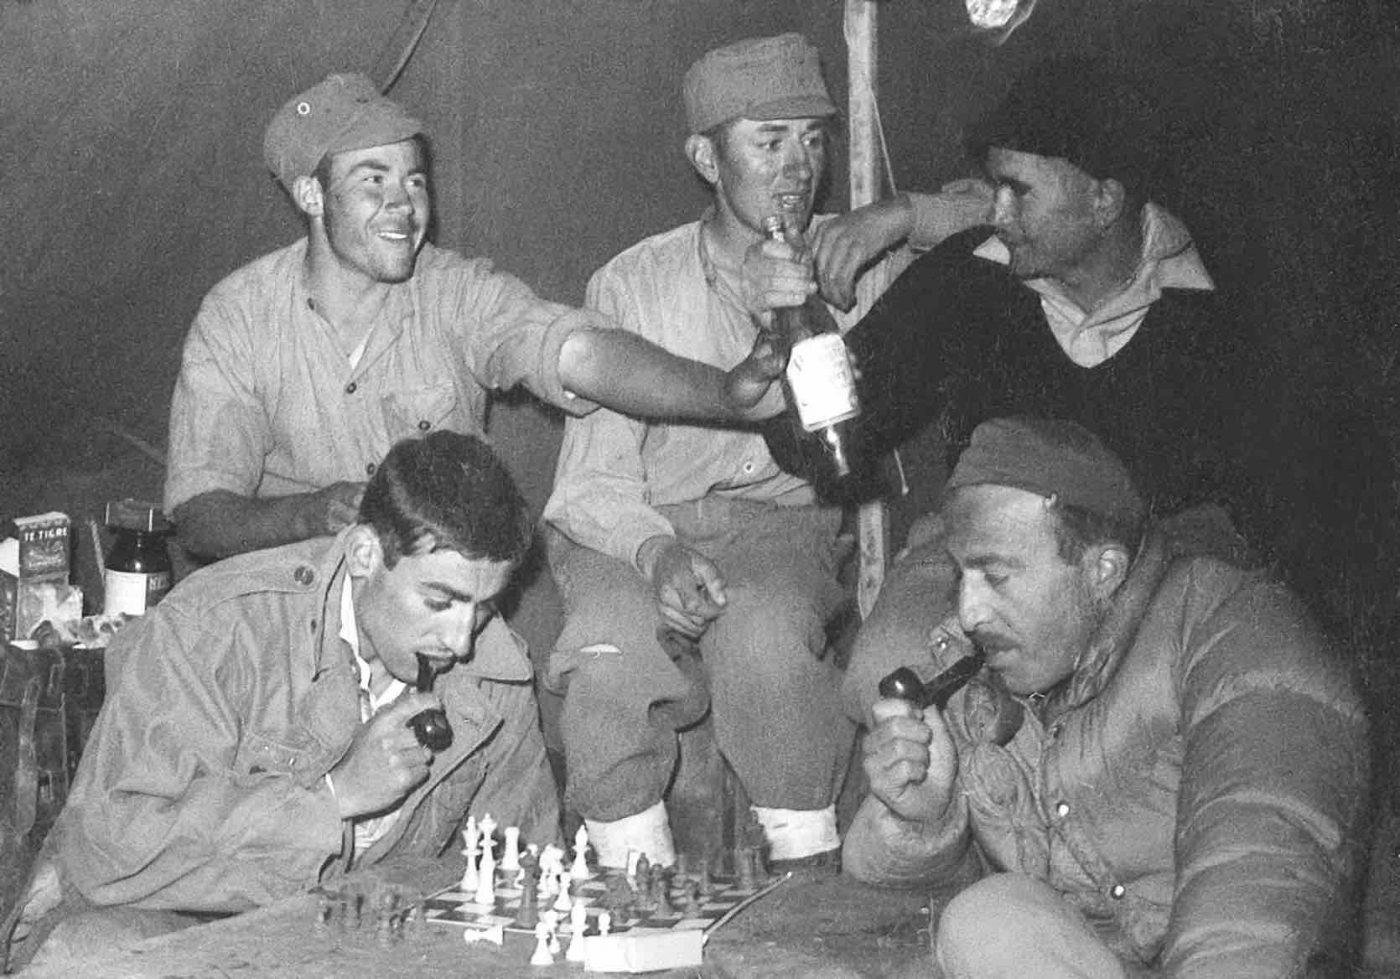 aconcagua Camp Base 1954